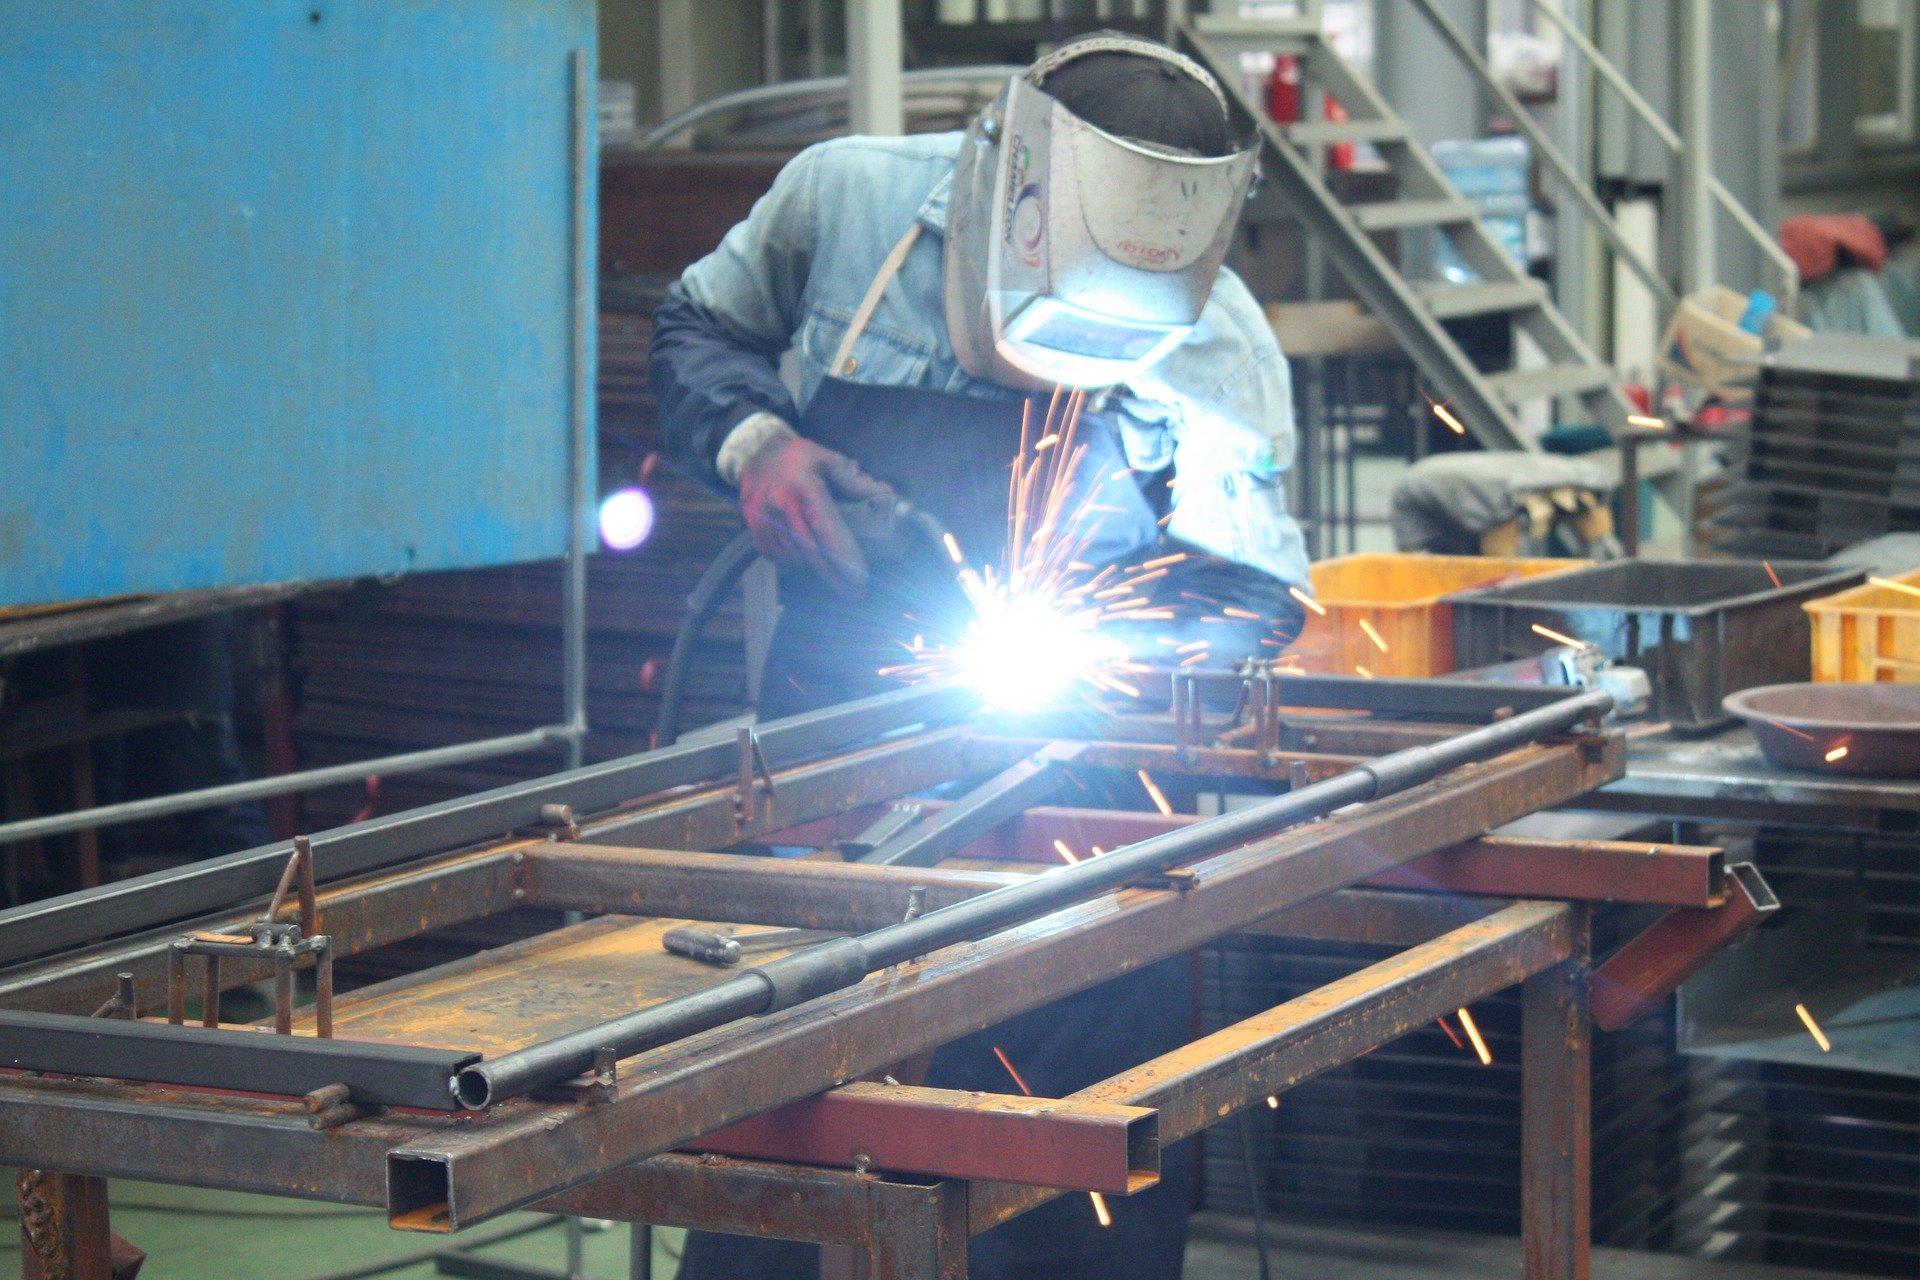 Empleo manufacturero sube 0.6% en diciembre, séptimo mes al alza